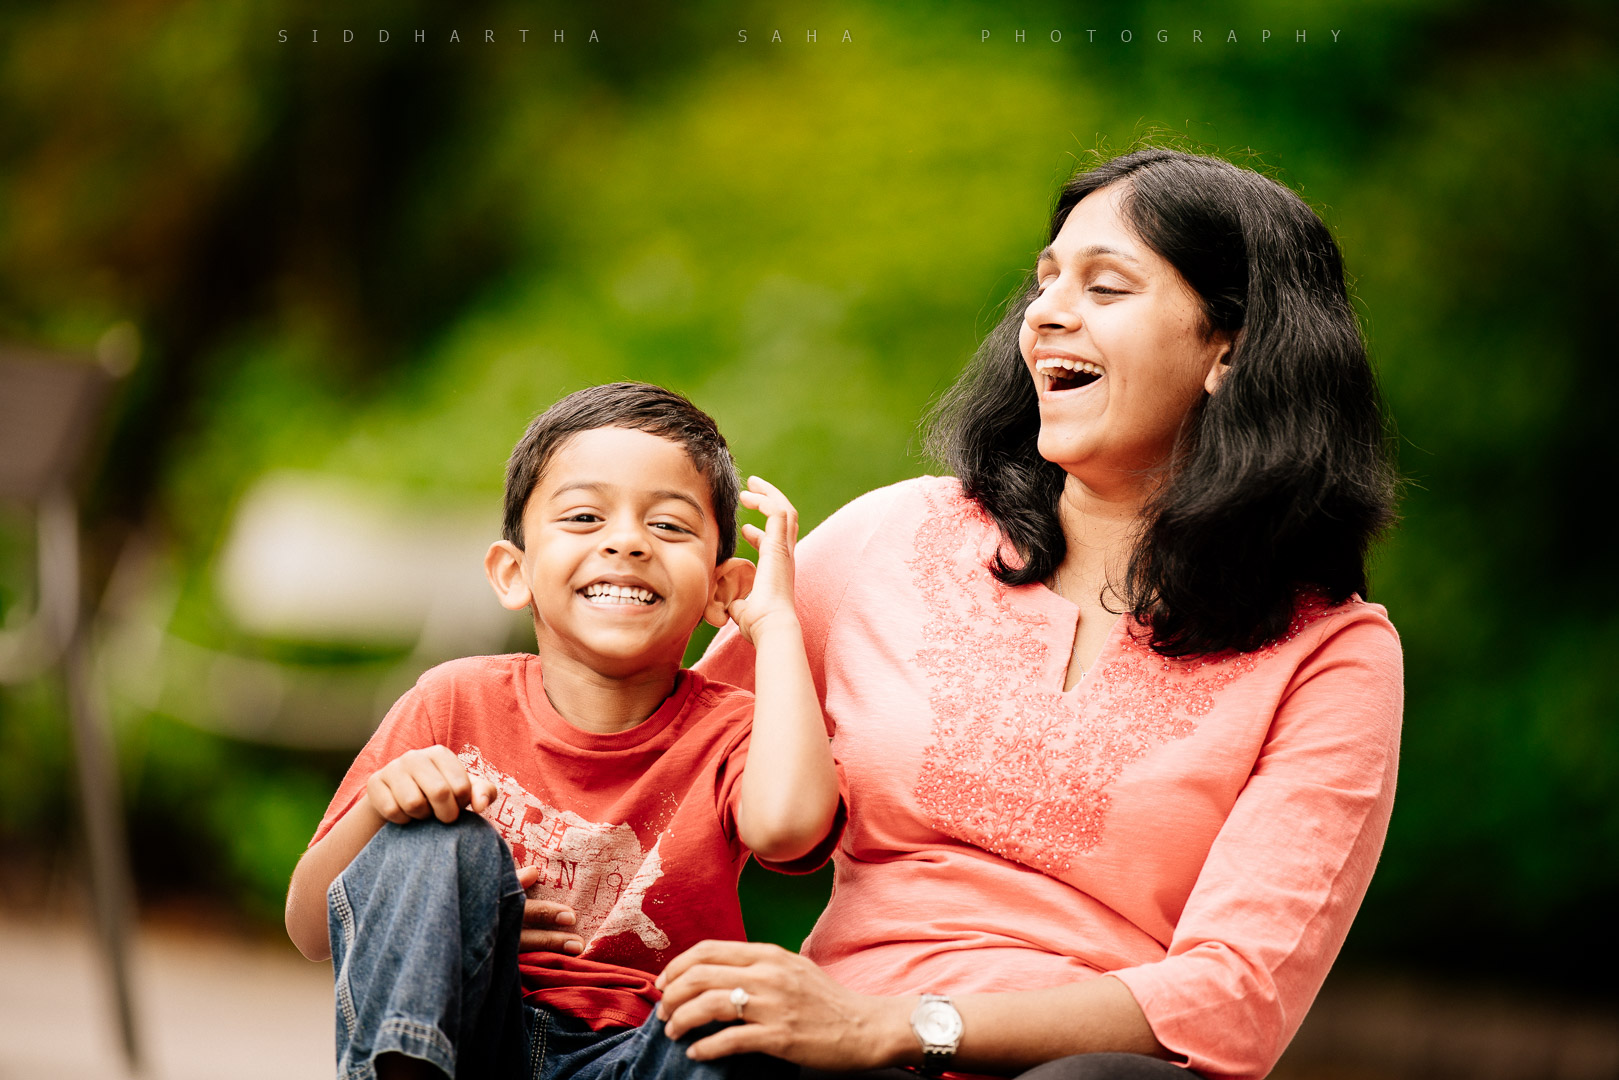 2015-08-08 - Padmaja Ketan Family Photoshoot - _DSC0072